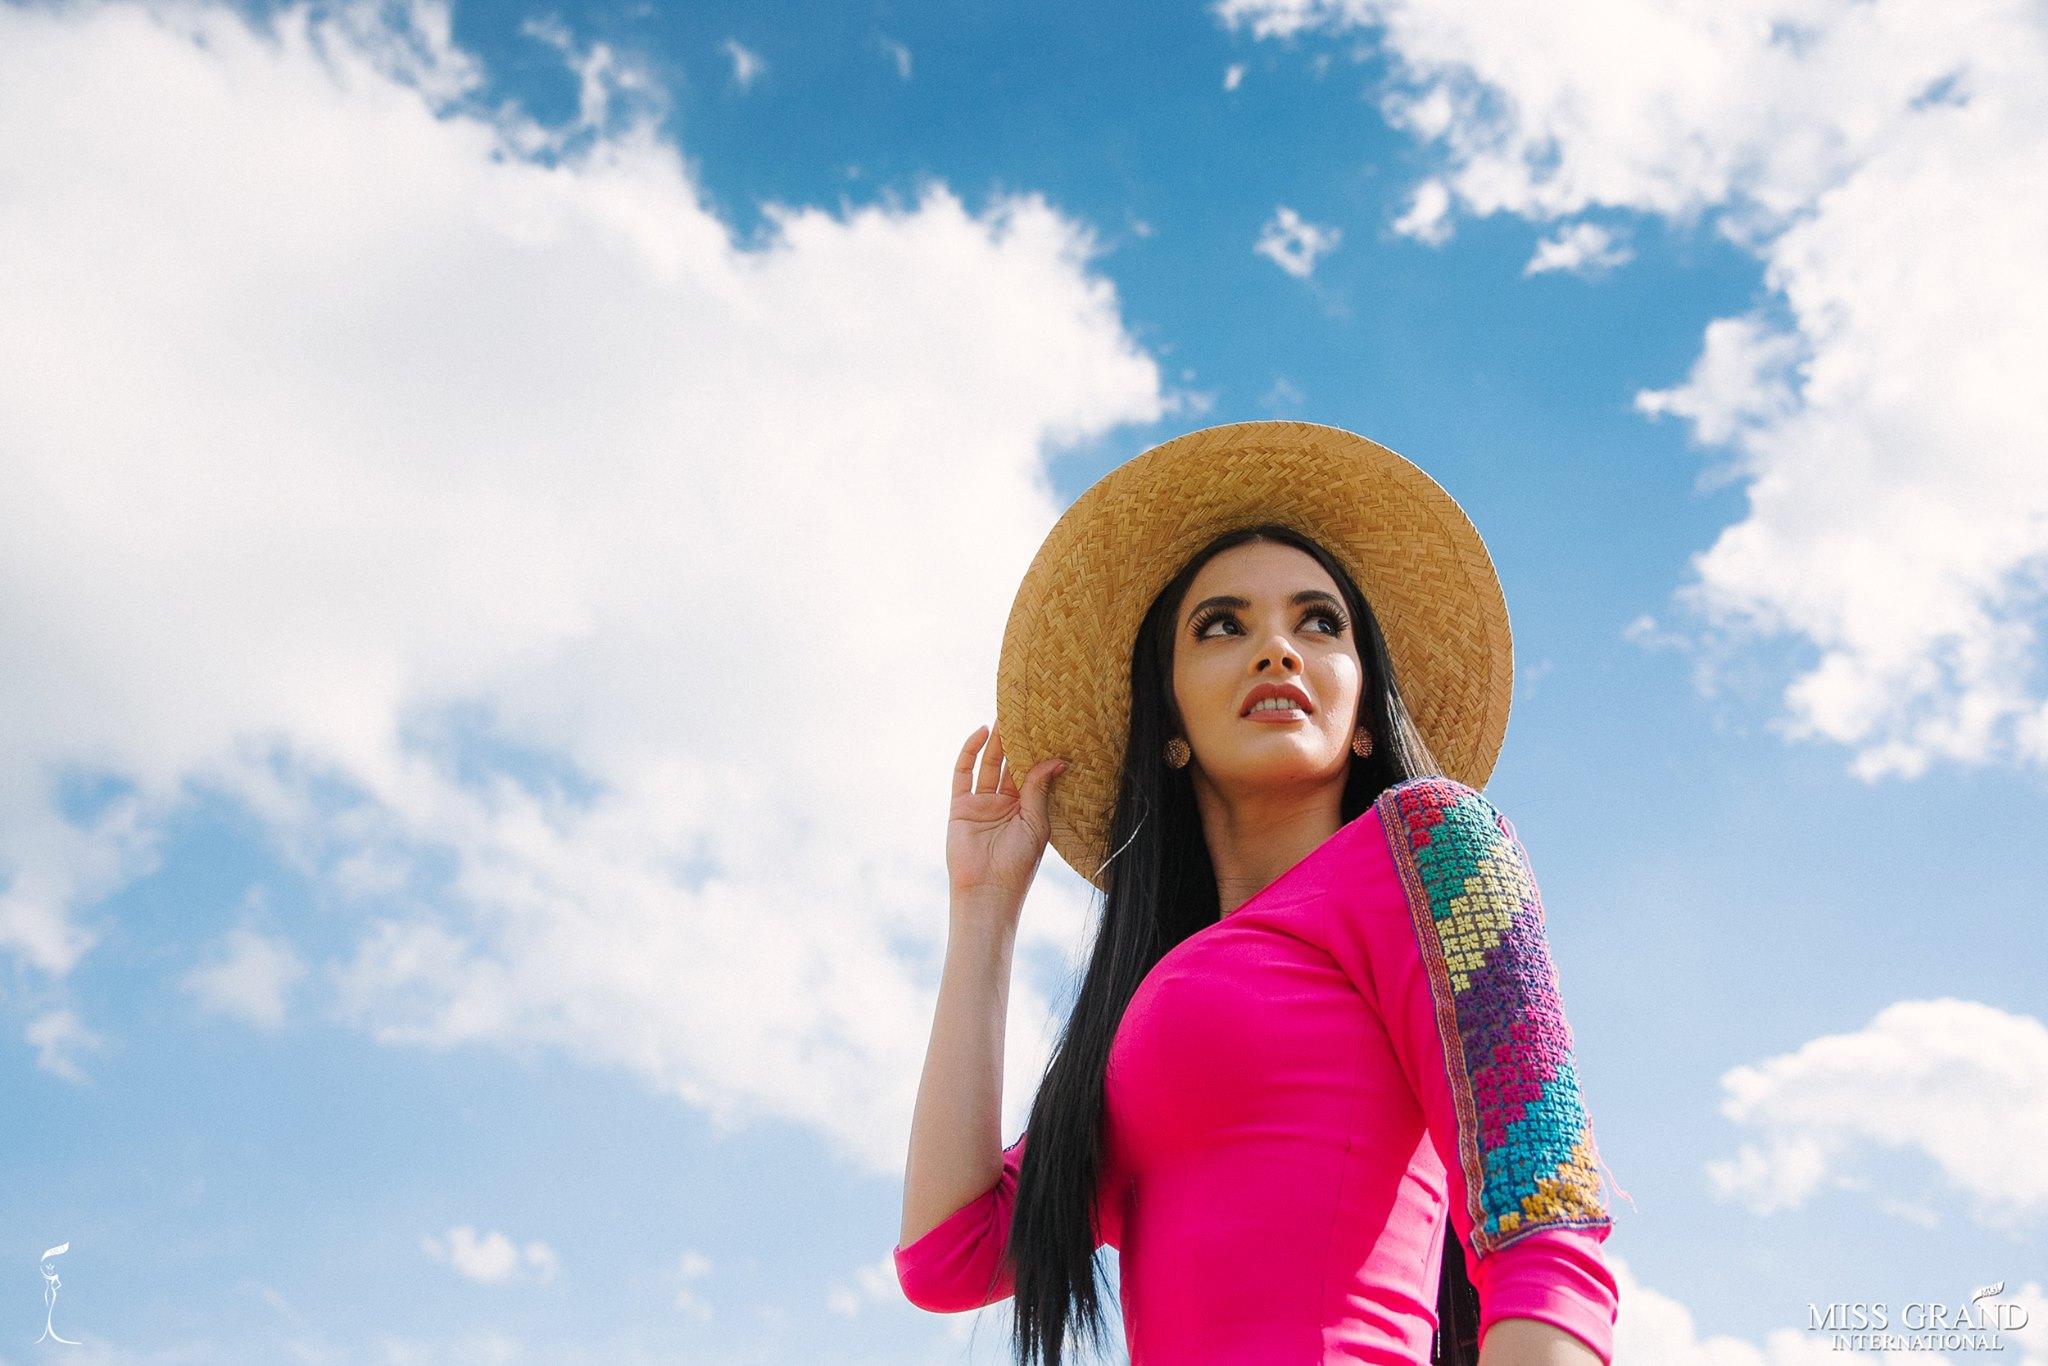 miss grand international 2018 visitando brasil para assistir a final de miss grand brasil 2019. - Página 3 Mb3hual5